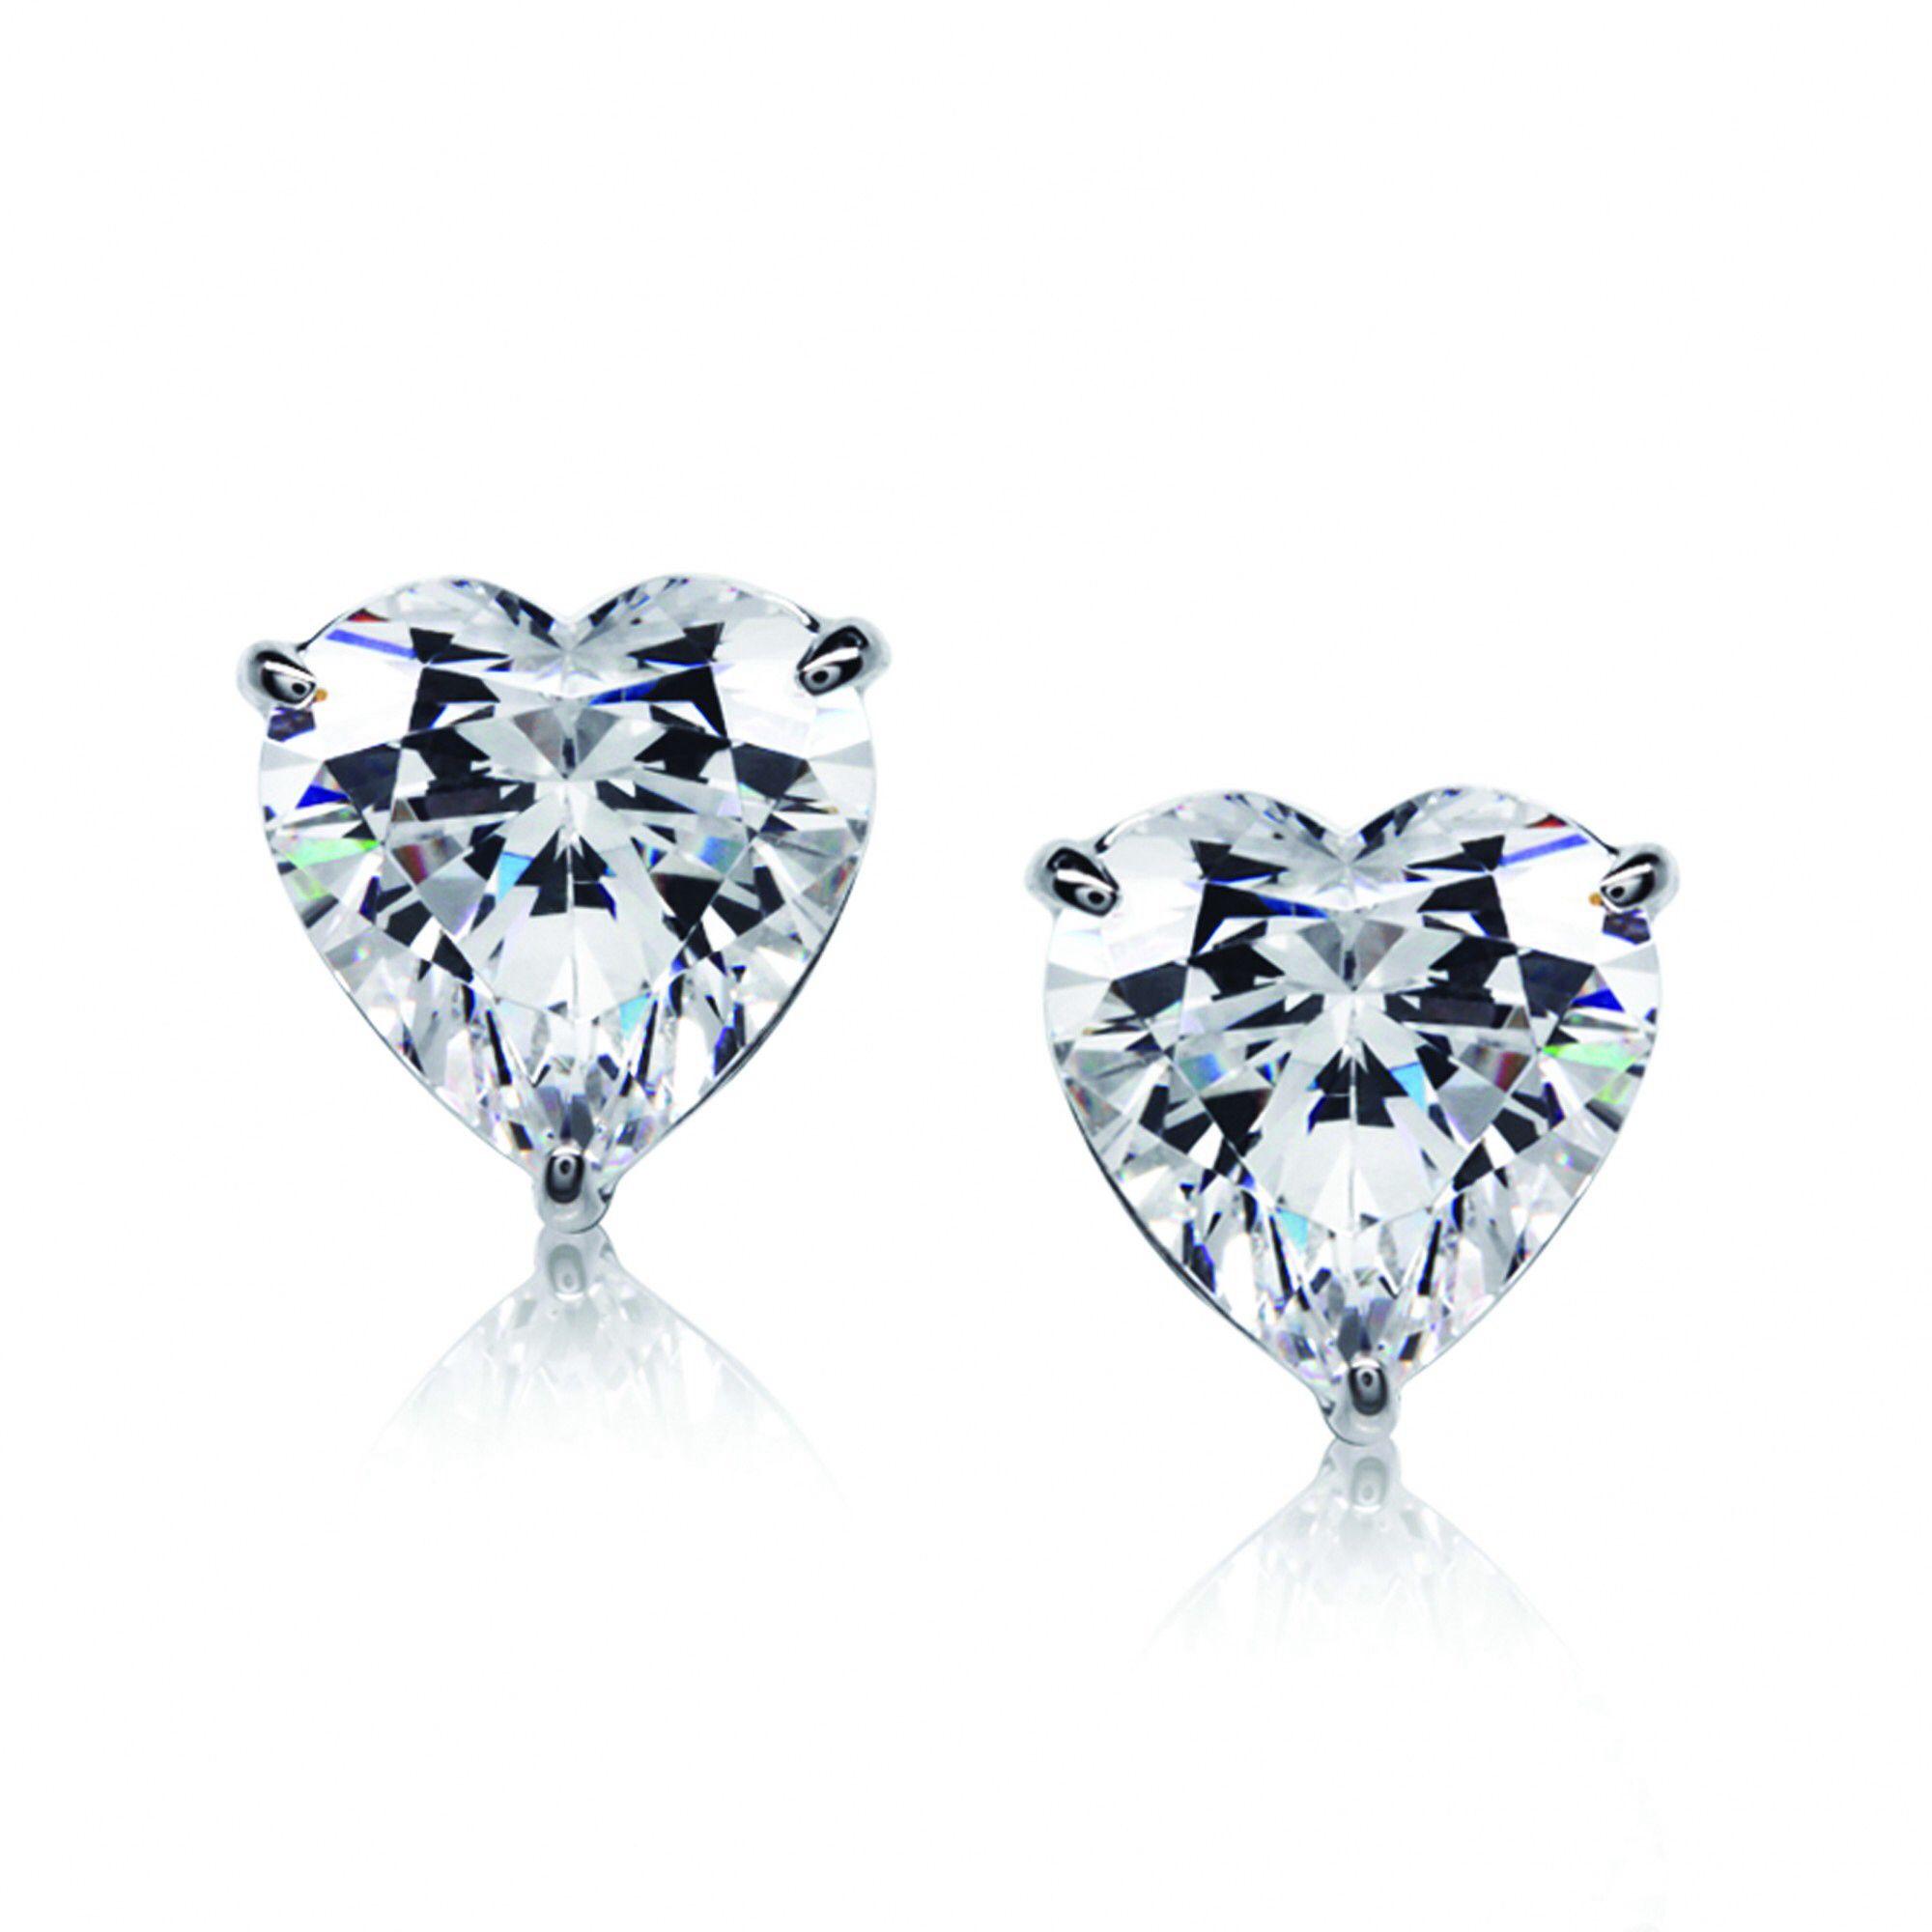 https://www.antonioboutique.com/media/catalog/product/cache/1/image/2000x/7bb53df000fdecfef9f95e4d915acab0/4/4/4474_hearts_for_you.jpg adresinden görsel.